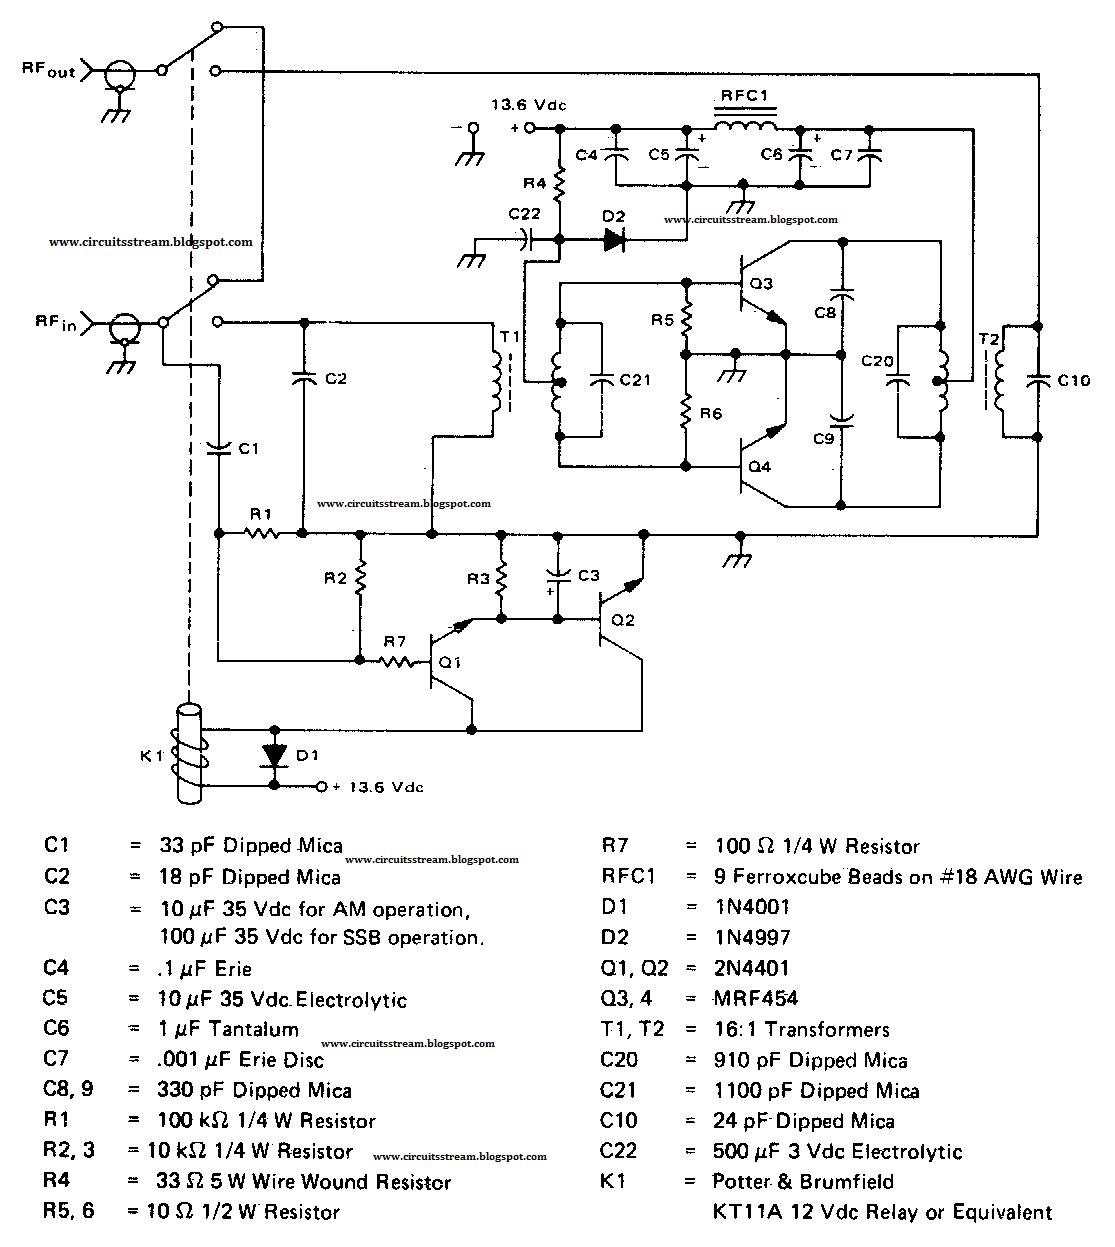 2000w power amplifier circuit diagram lincoln welder wiring ua741 diagrams